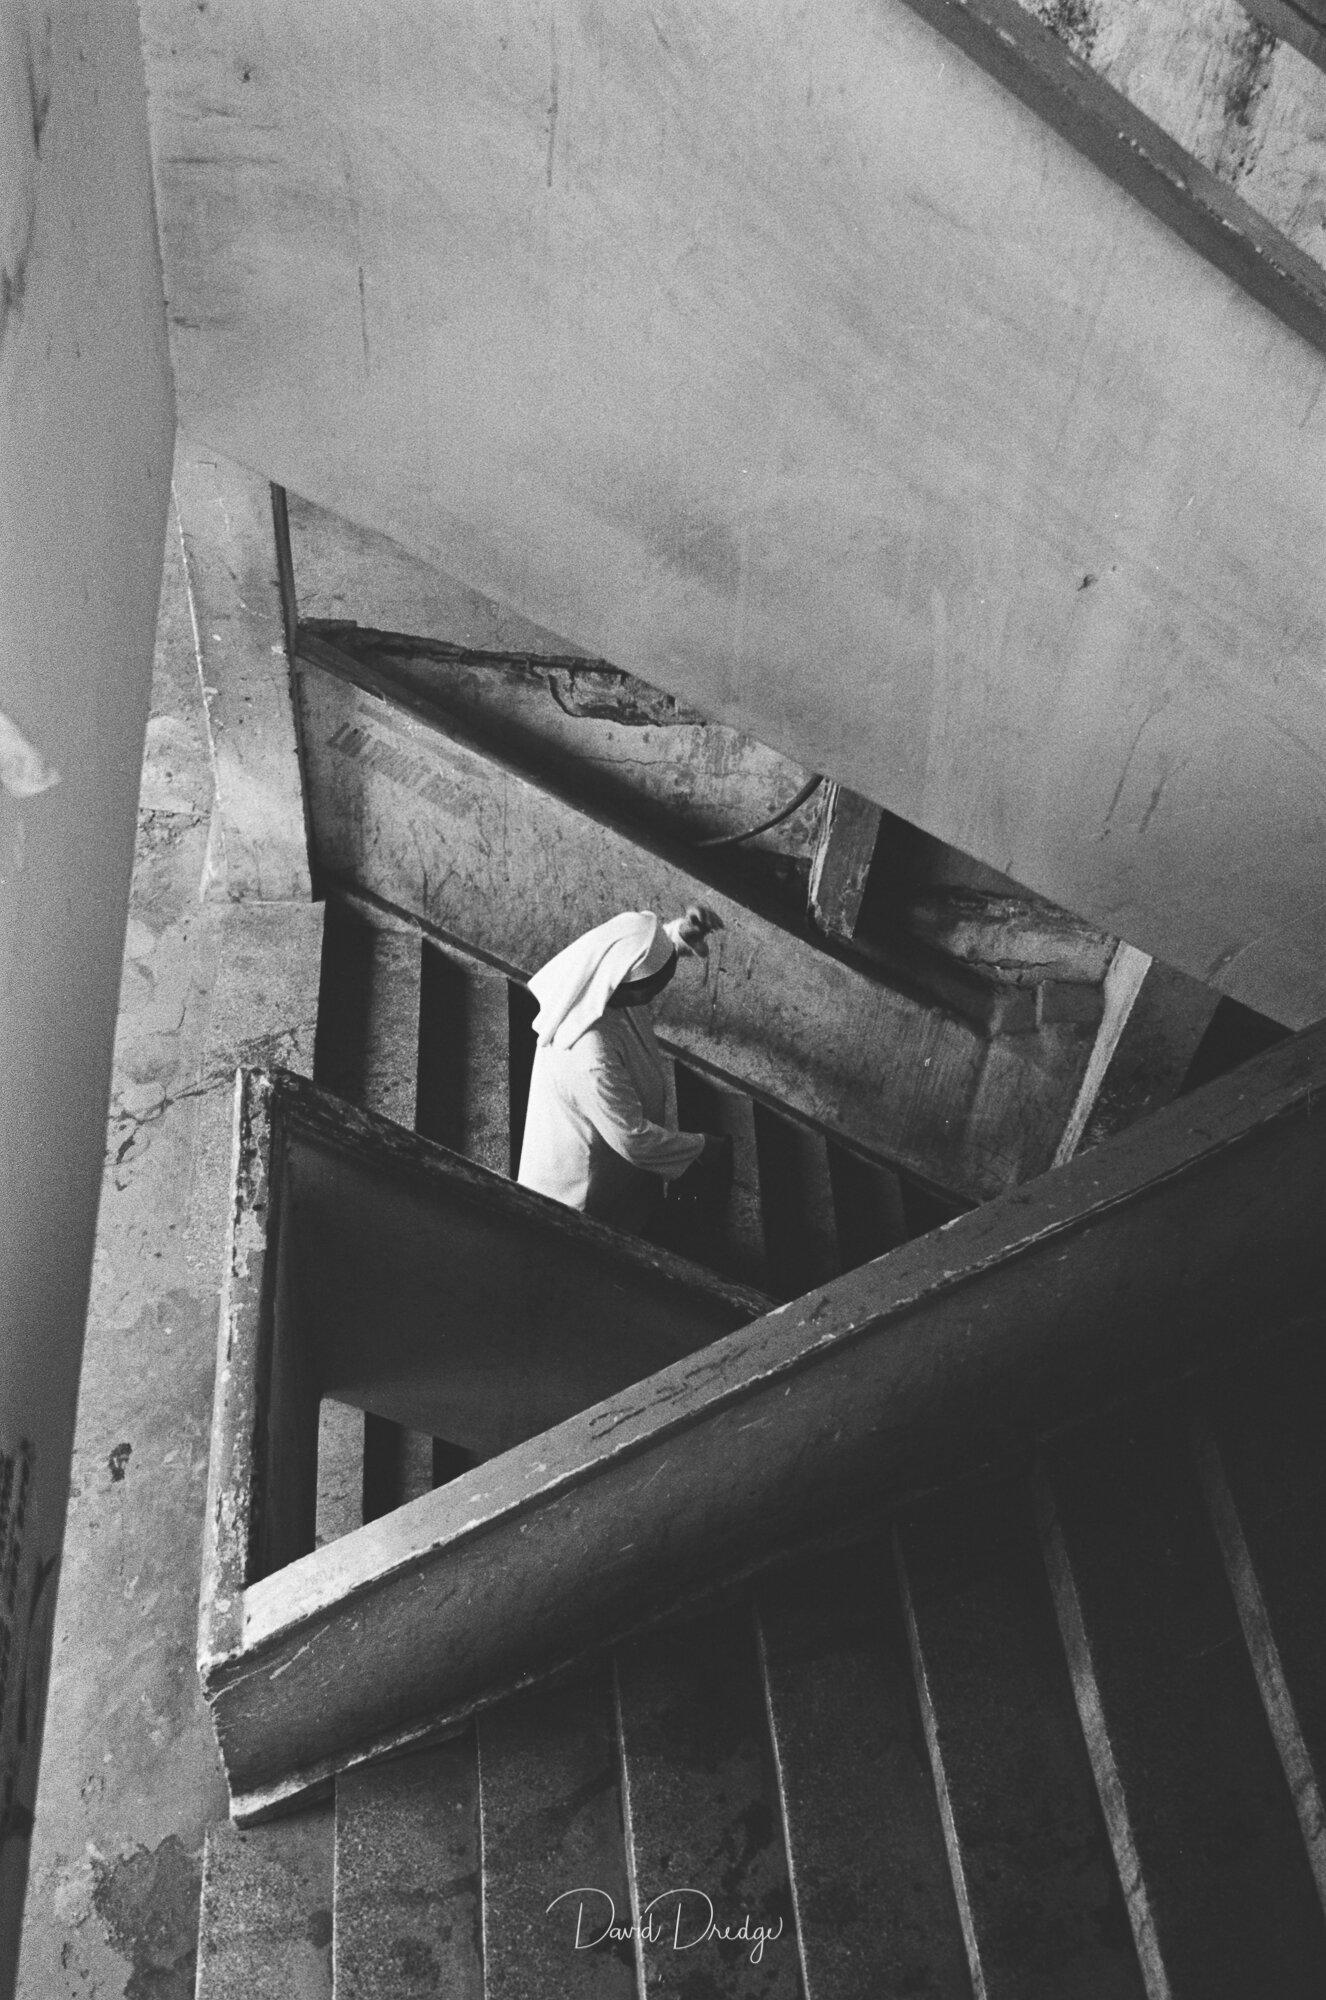 David Dredge Art Print Street Photography Stairs and Nun